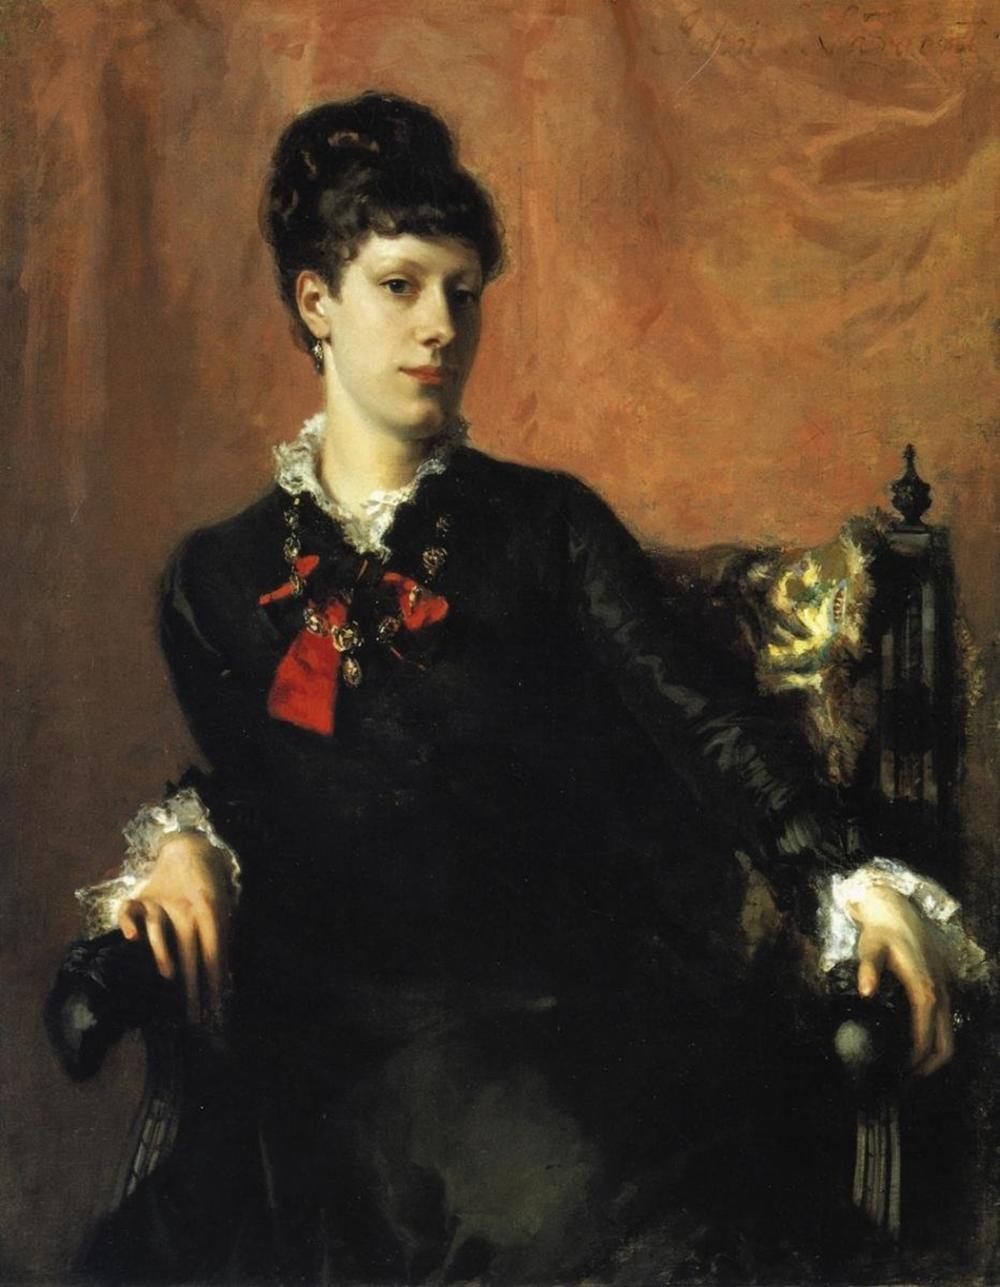 JOHN SINGER SARGENT - MISS FRANCES SHERBORNE RIDLEY WATTS